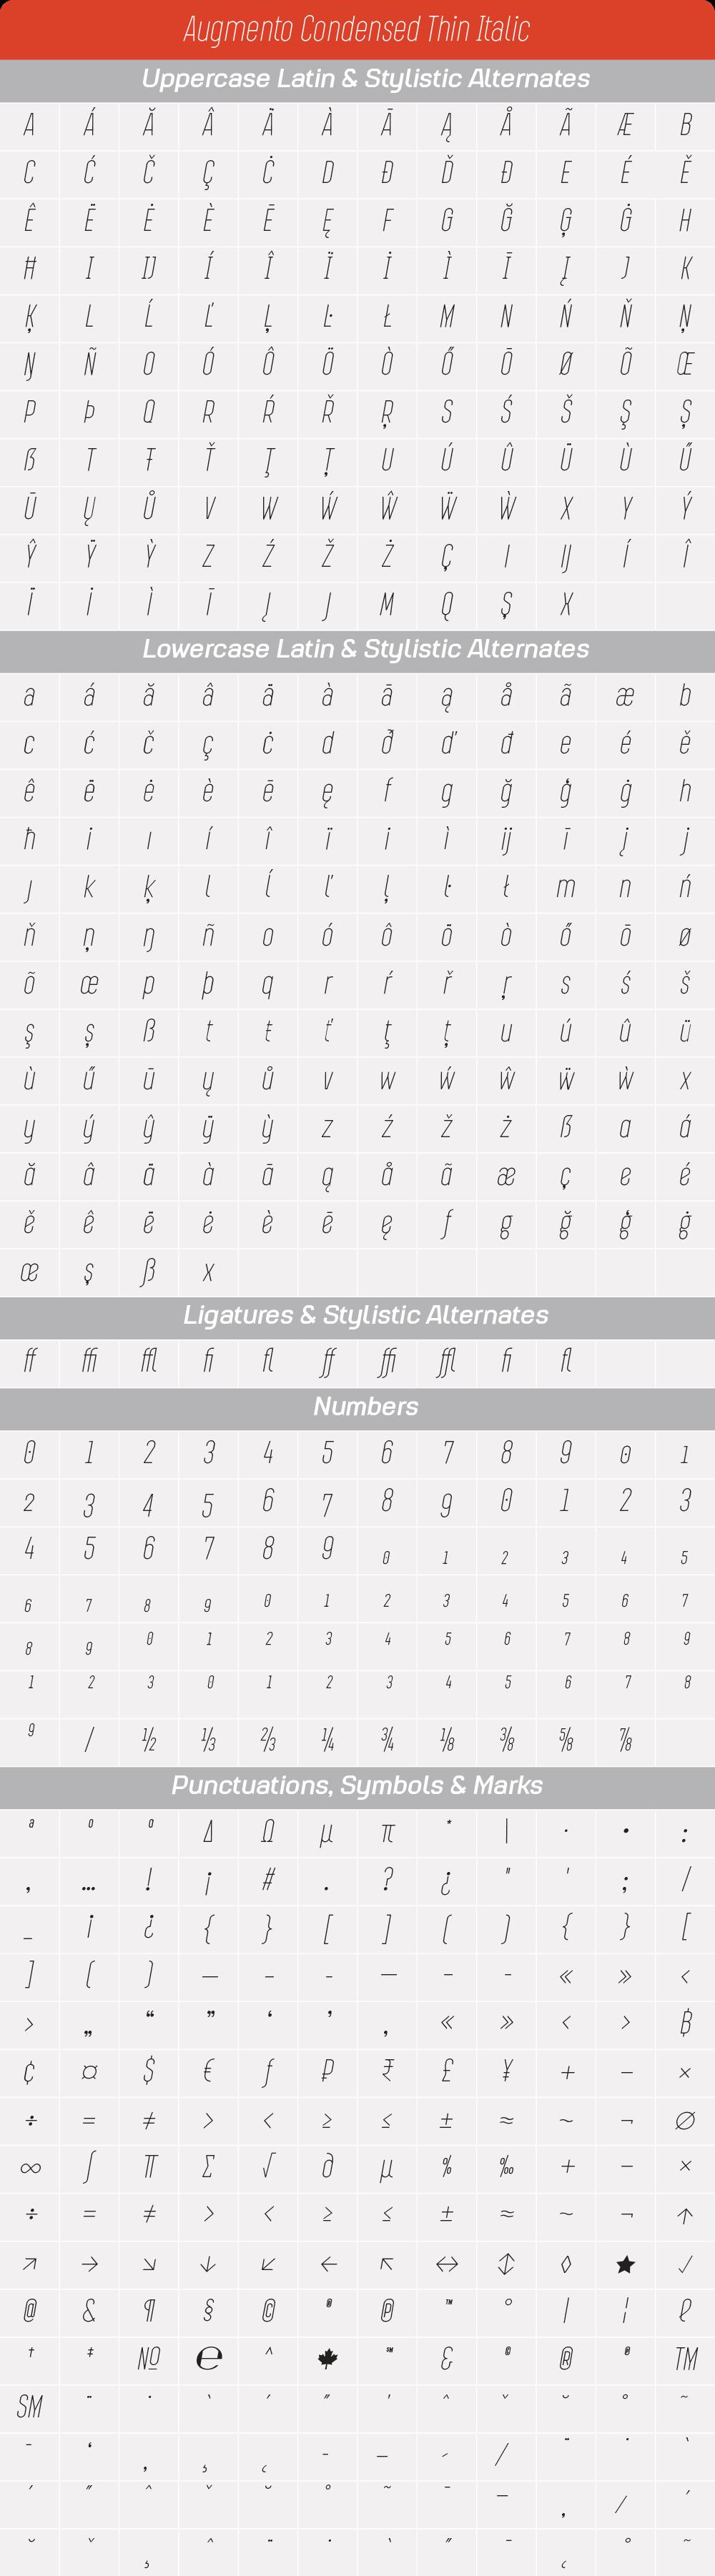 Condensed Thin ItalicAugmento-GlyphTable.png